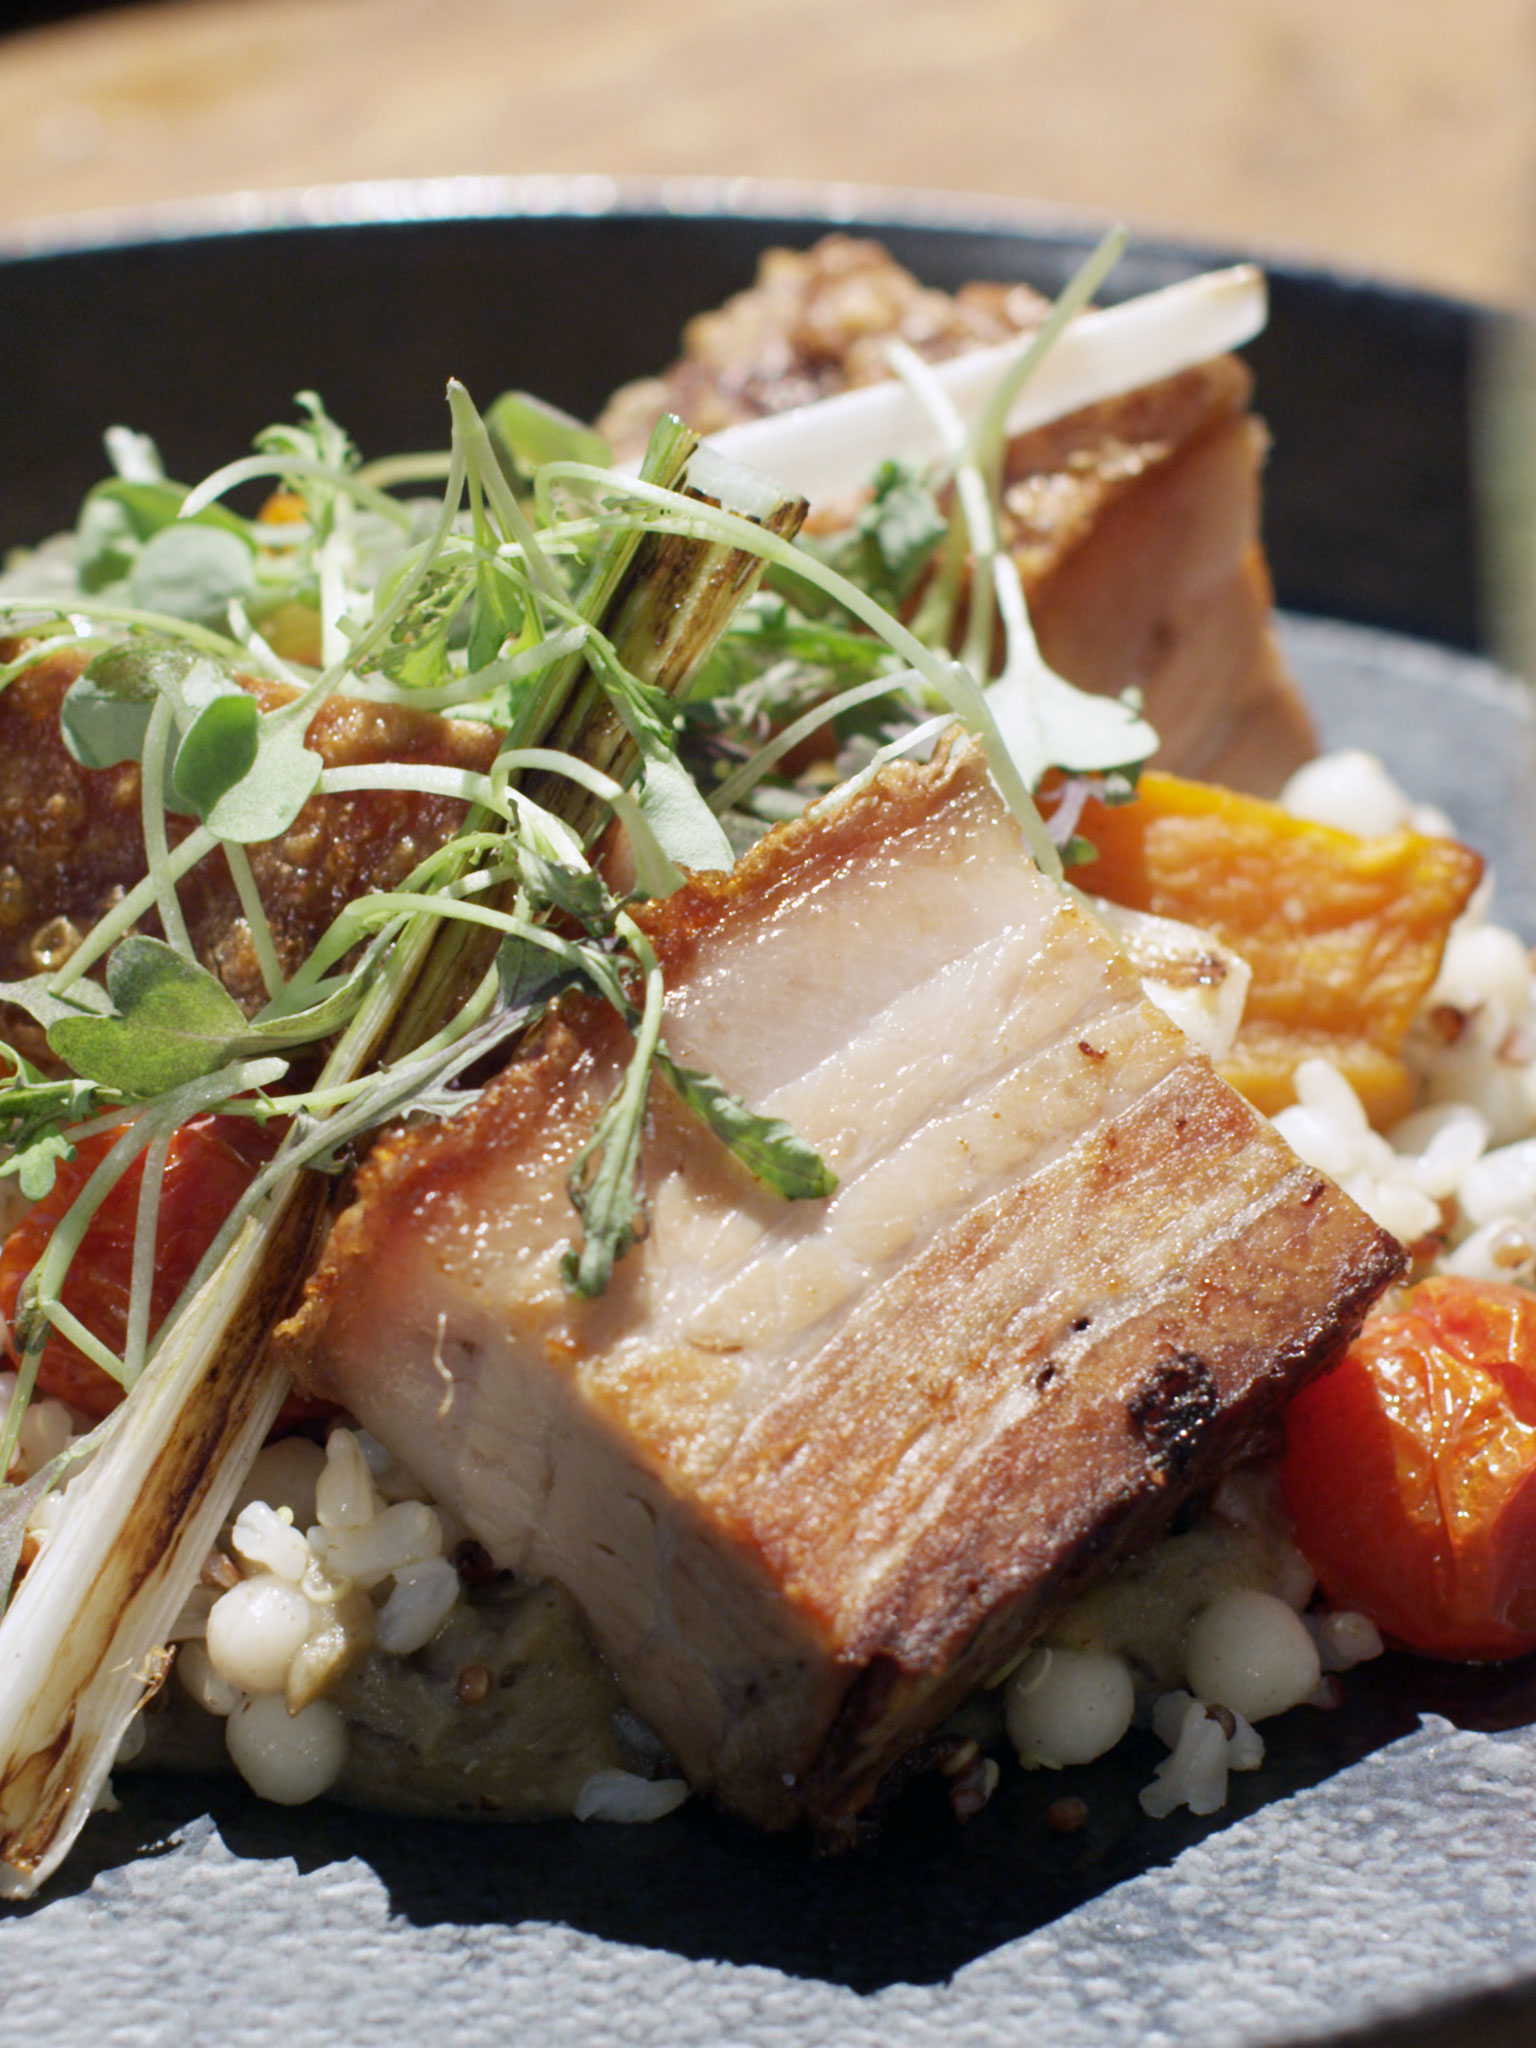 2-192-Grain-and-Pork-Belly-Salad-web.jpg